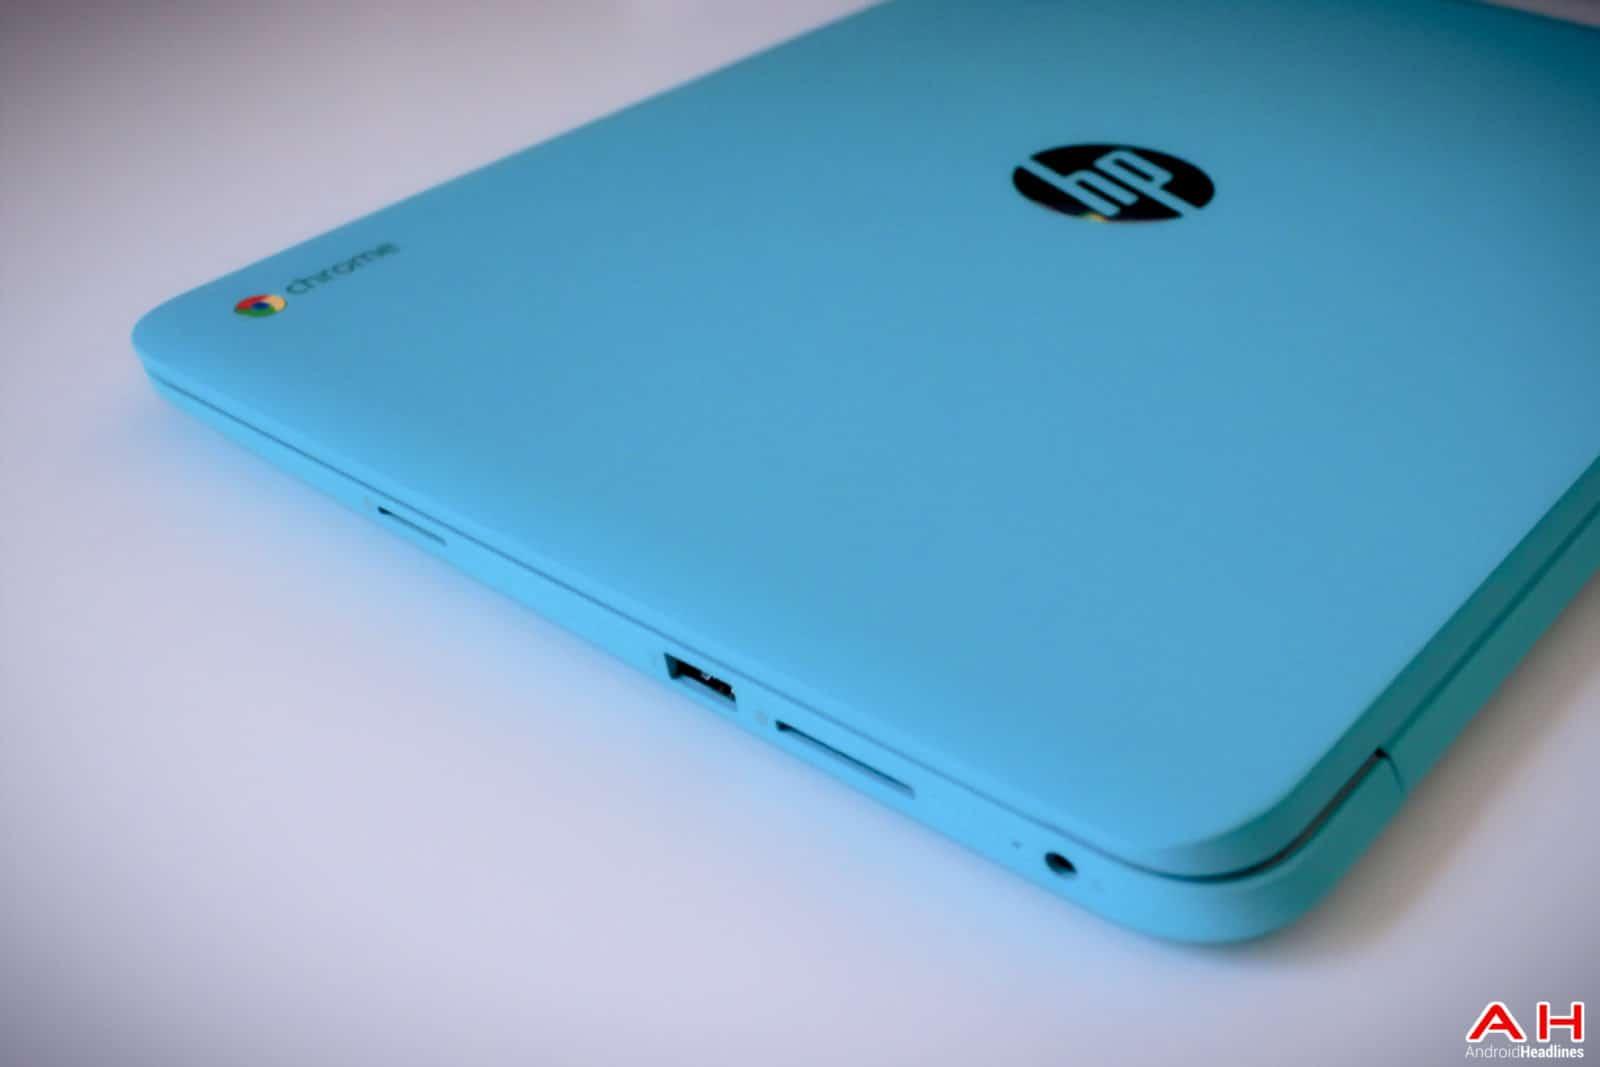 AH HP Chrome Chromebook 14-10